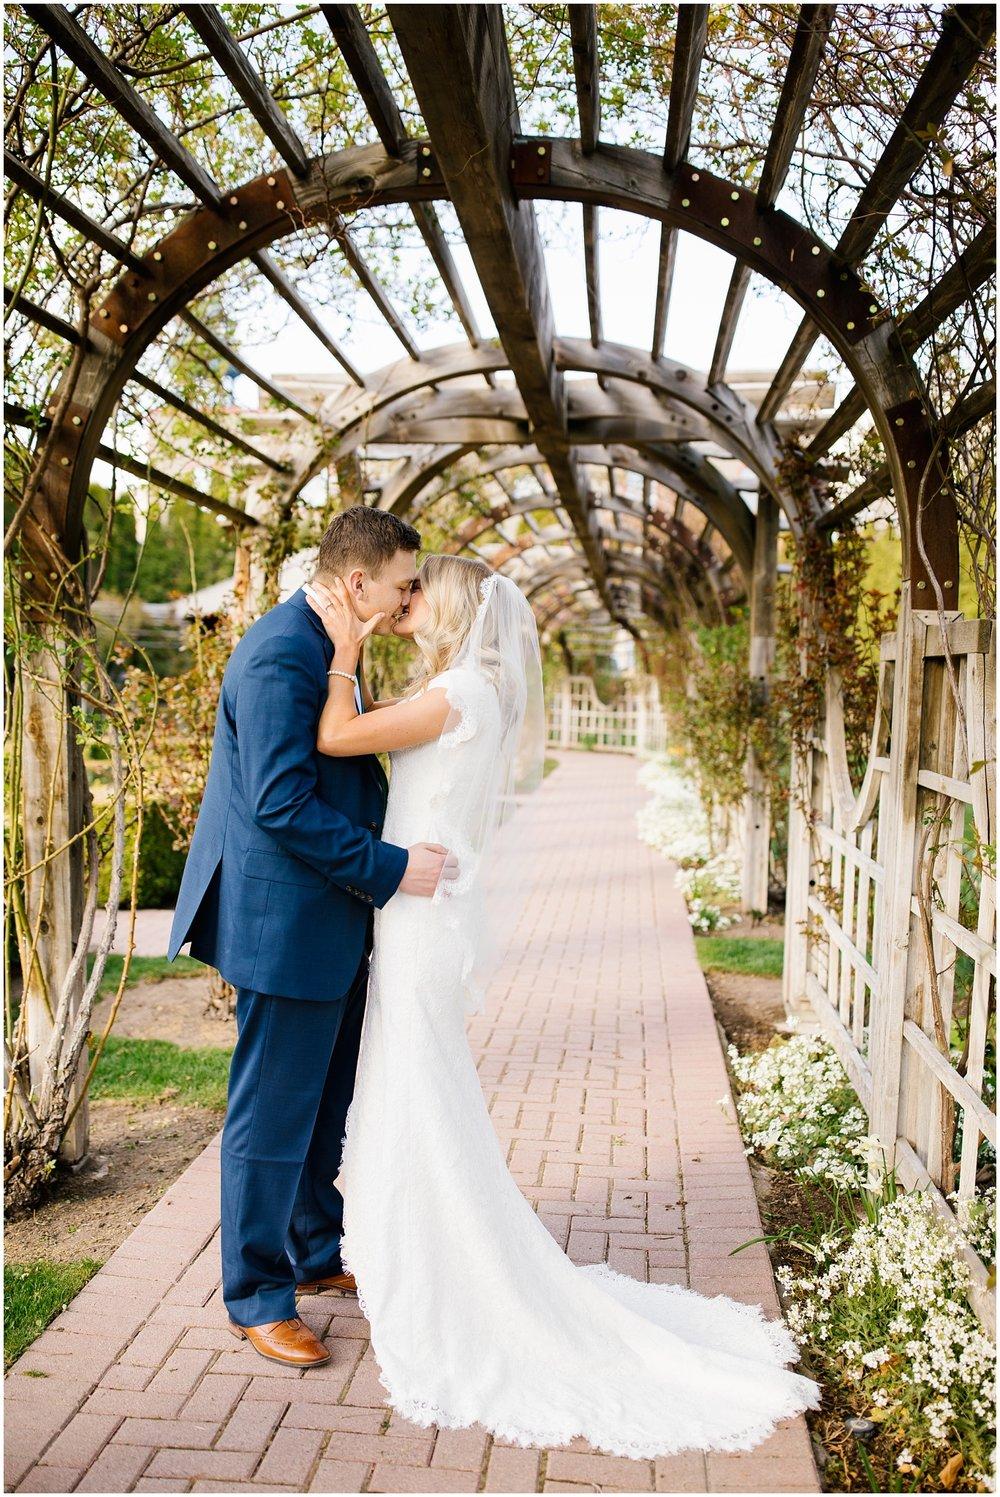 TA-Bridals-8_Lizzie-B-Imagery-Utah-Wedding-Photographer-Park-City-Salt-Lake-City-Thanksgiving-Point-Ashton-Gardens-Lehi-Utah.jpg